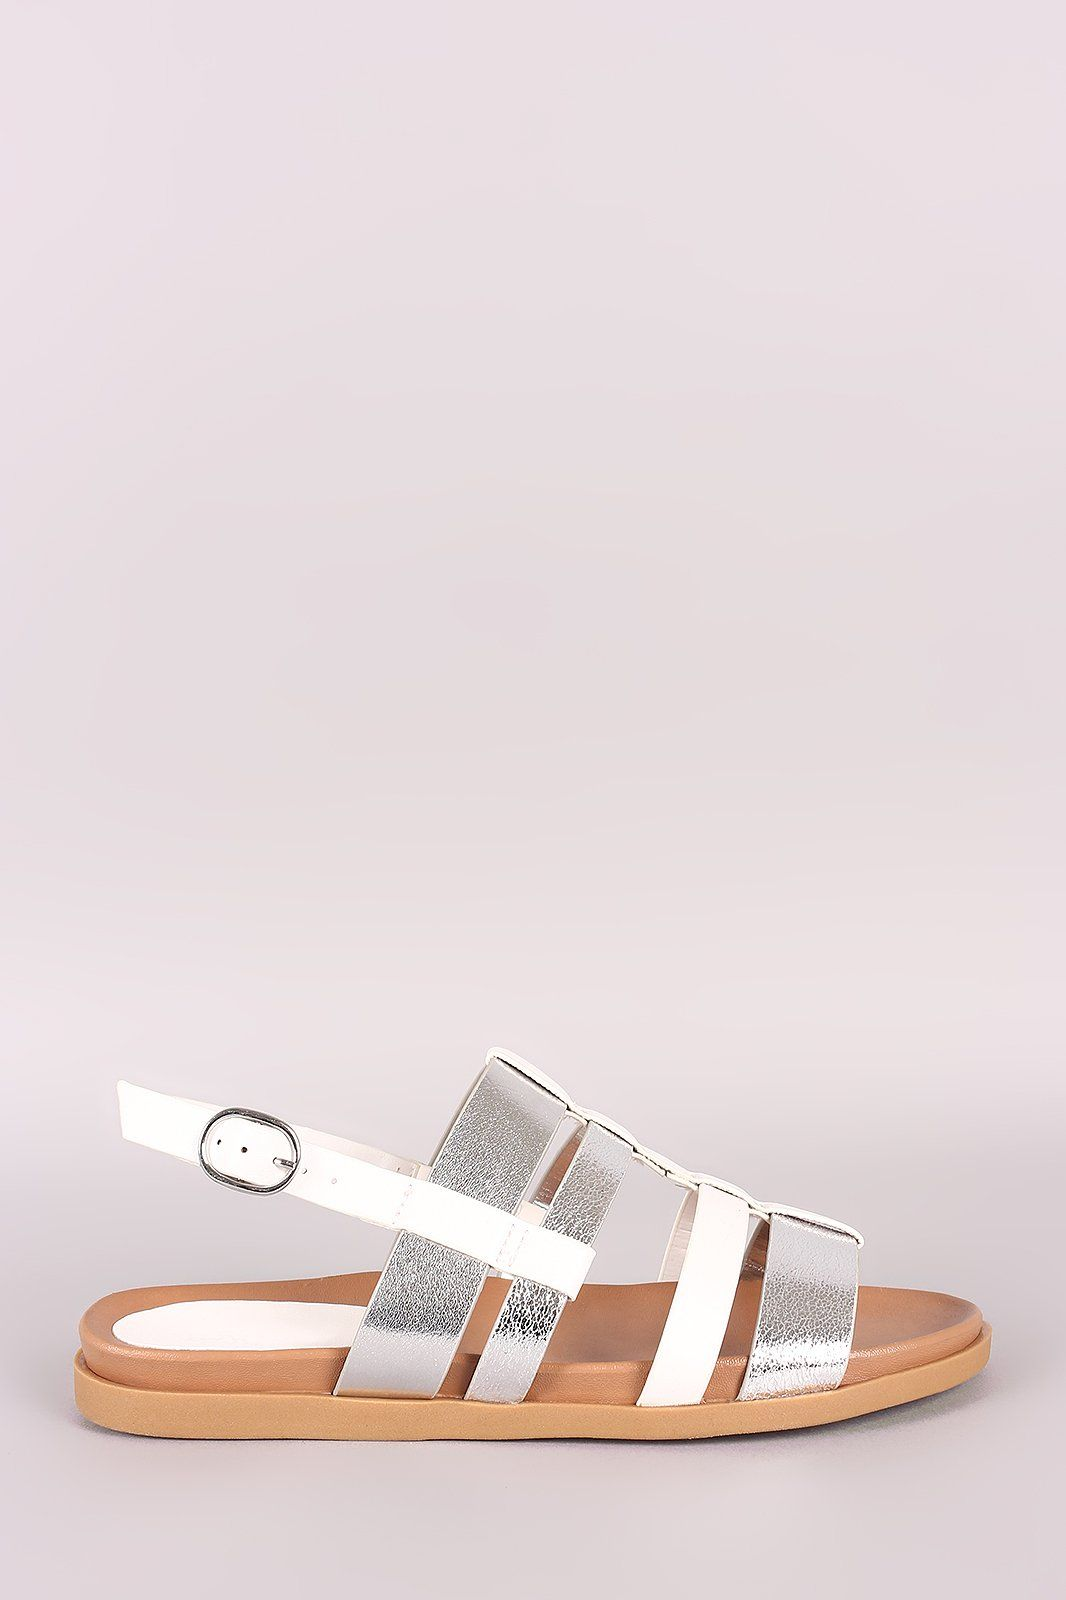 f1a8c83de5e51 This flat sandal features a two tone vegan leather